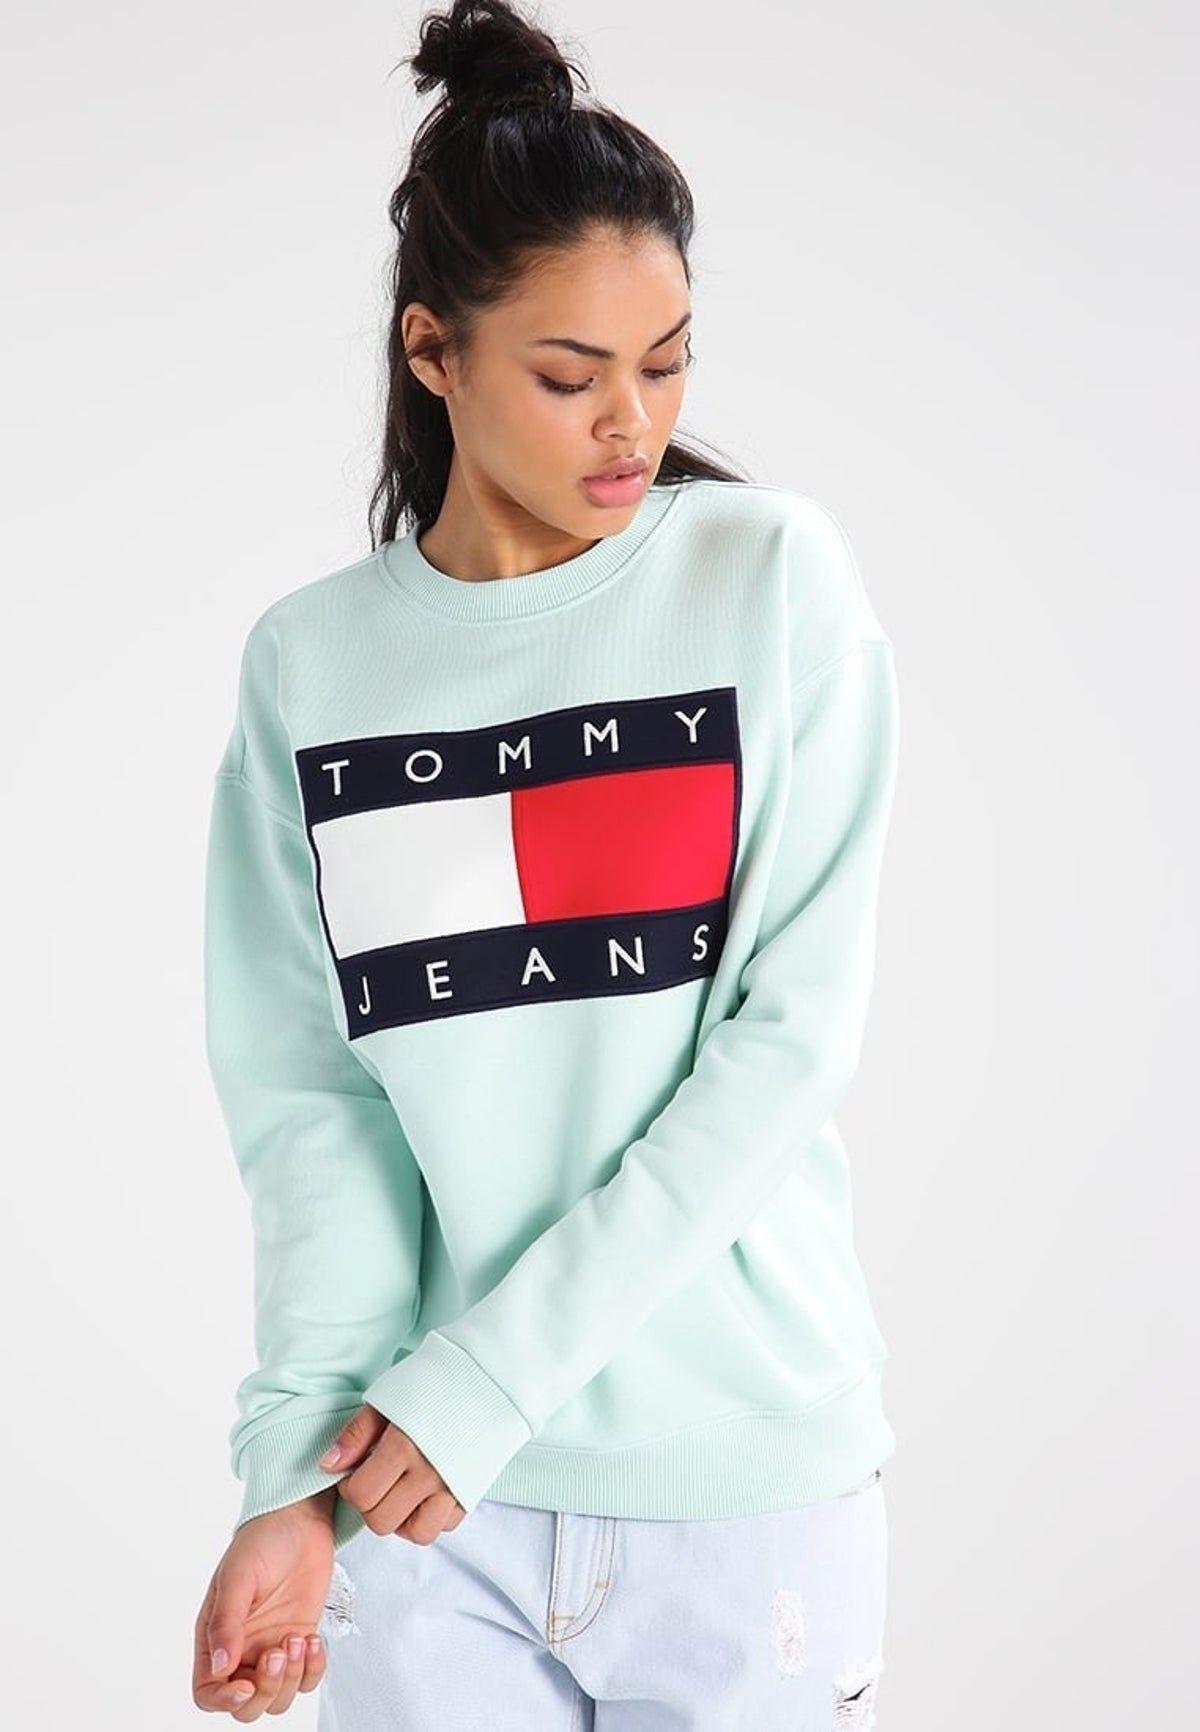 Tommy Hilfiger Mint Green Sweatshirt Tommy Clothes Sweatshirts Tommy Hilfiger Outfit [ 1732 x 1200 Pixel ]